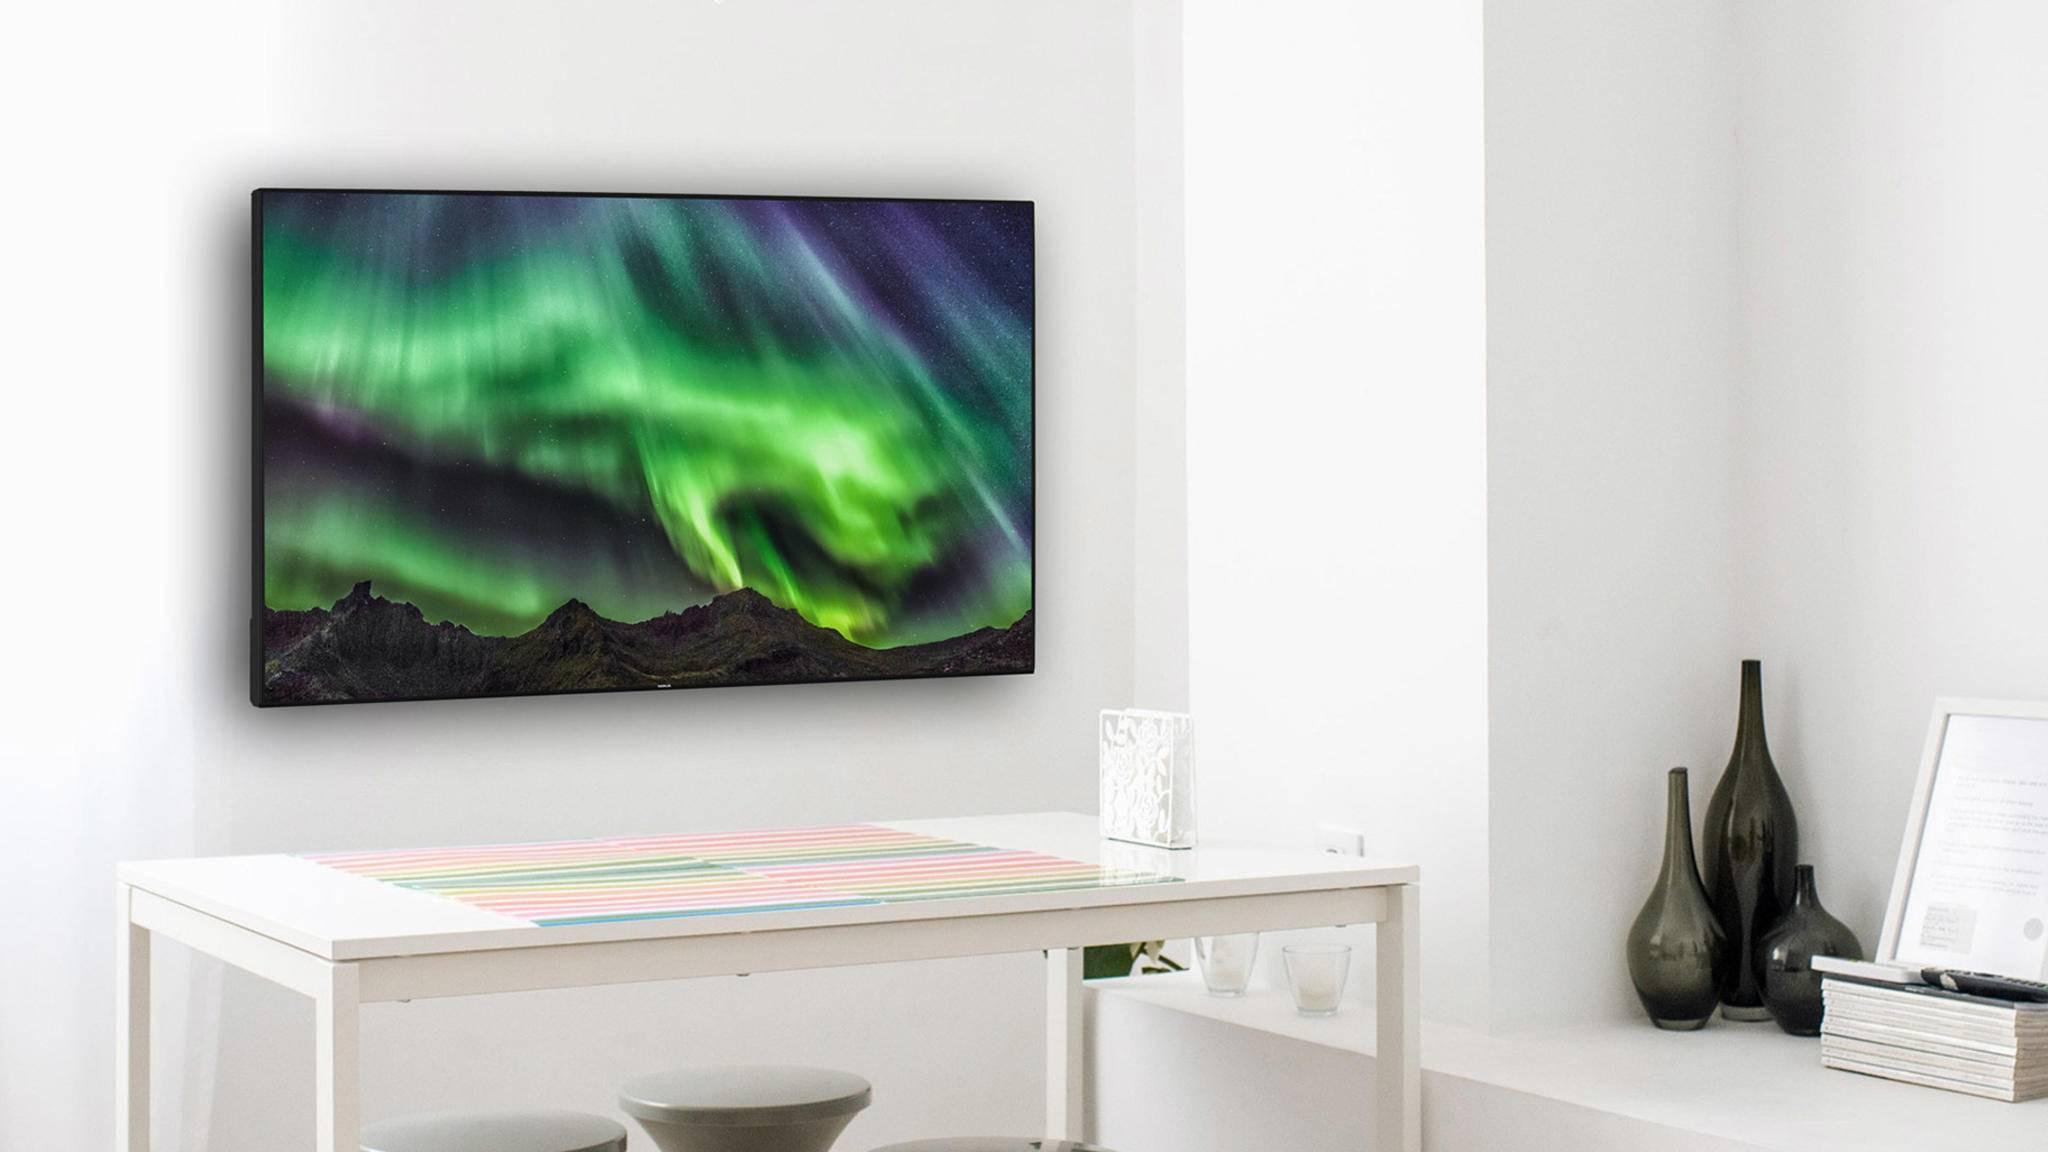 nokia-tv